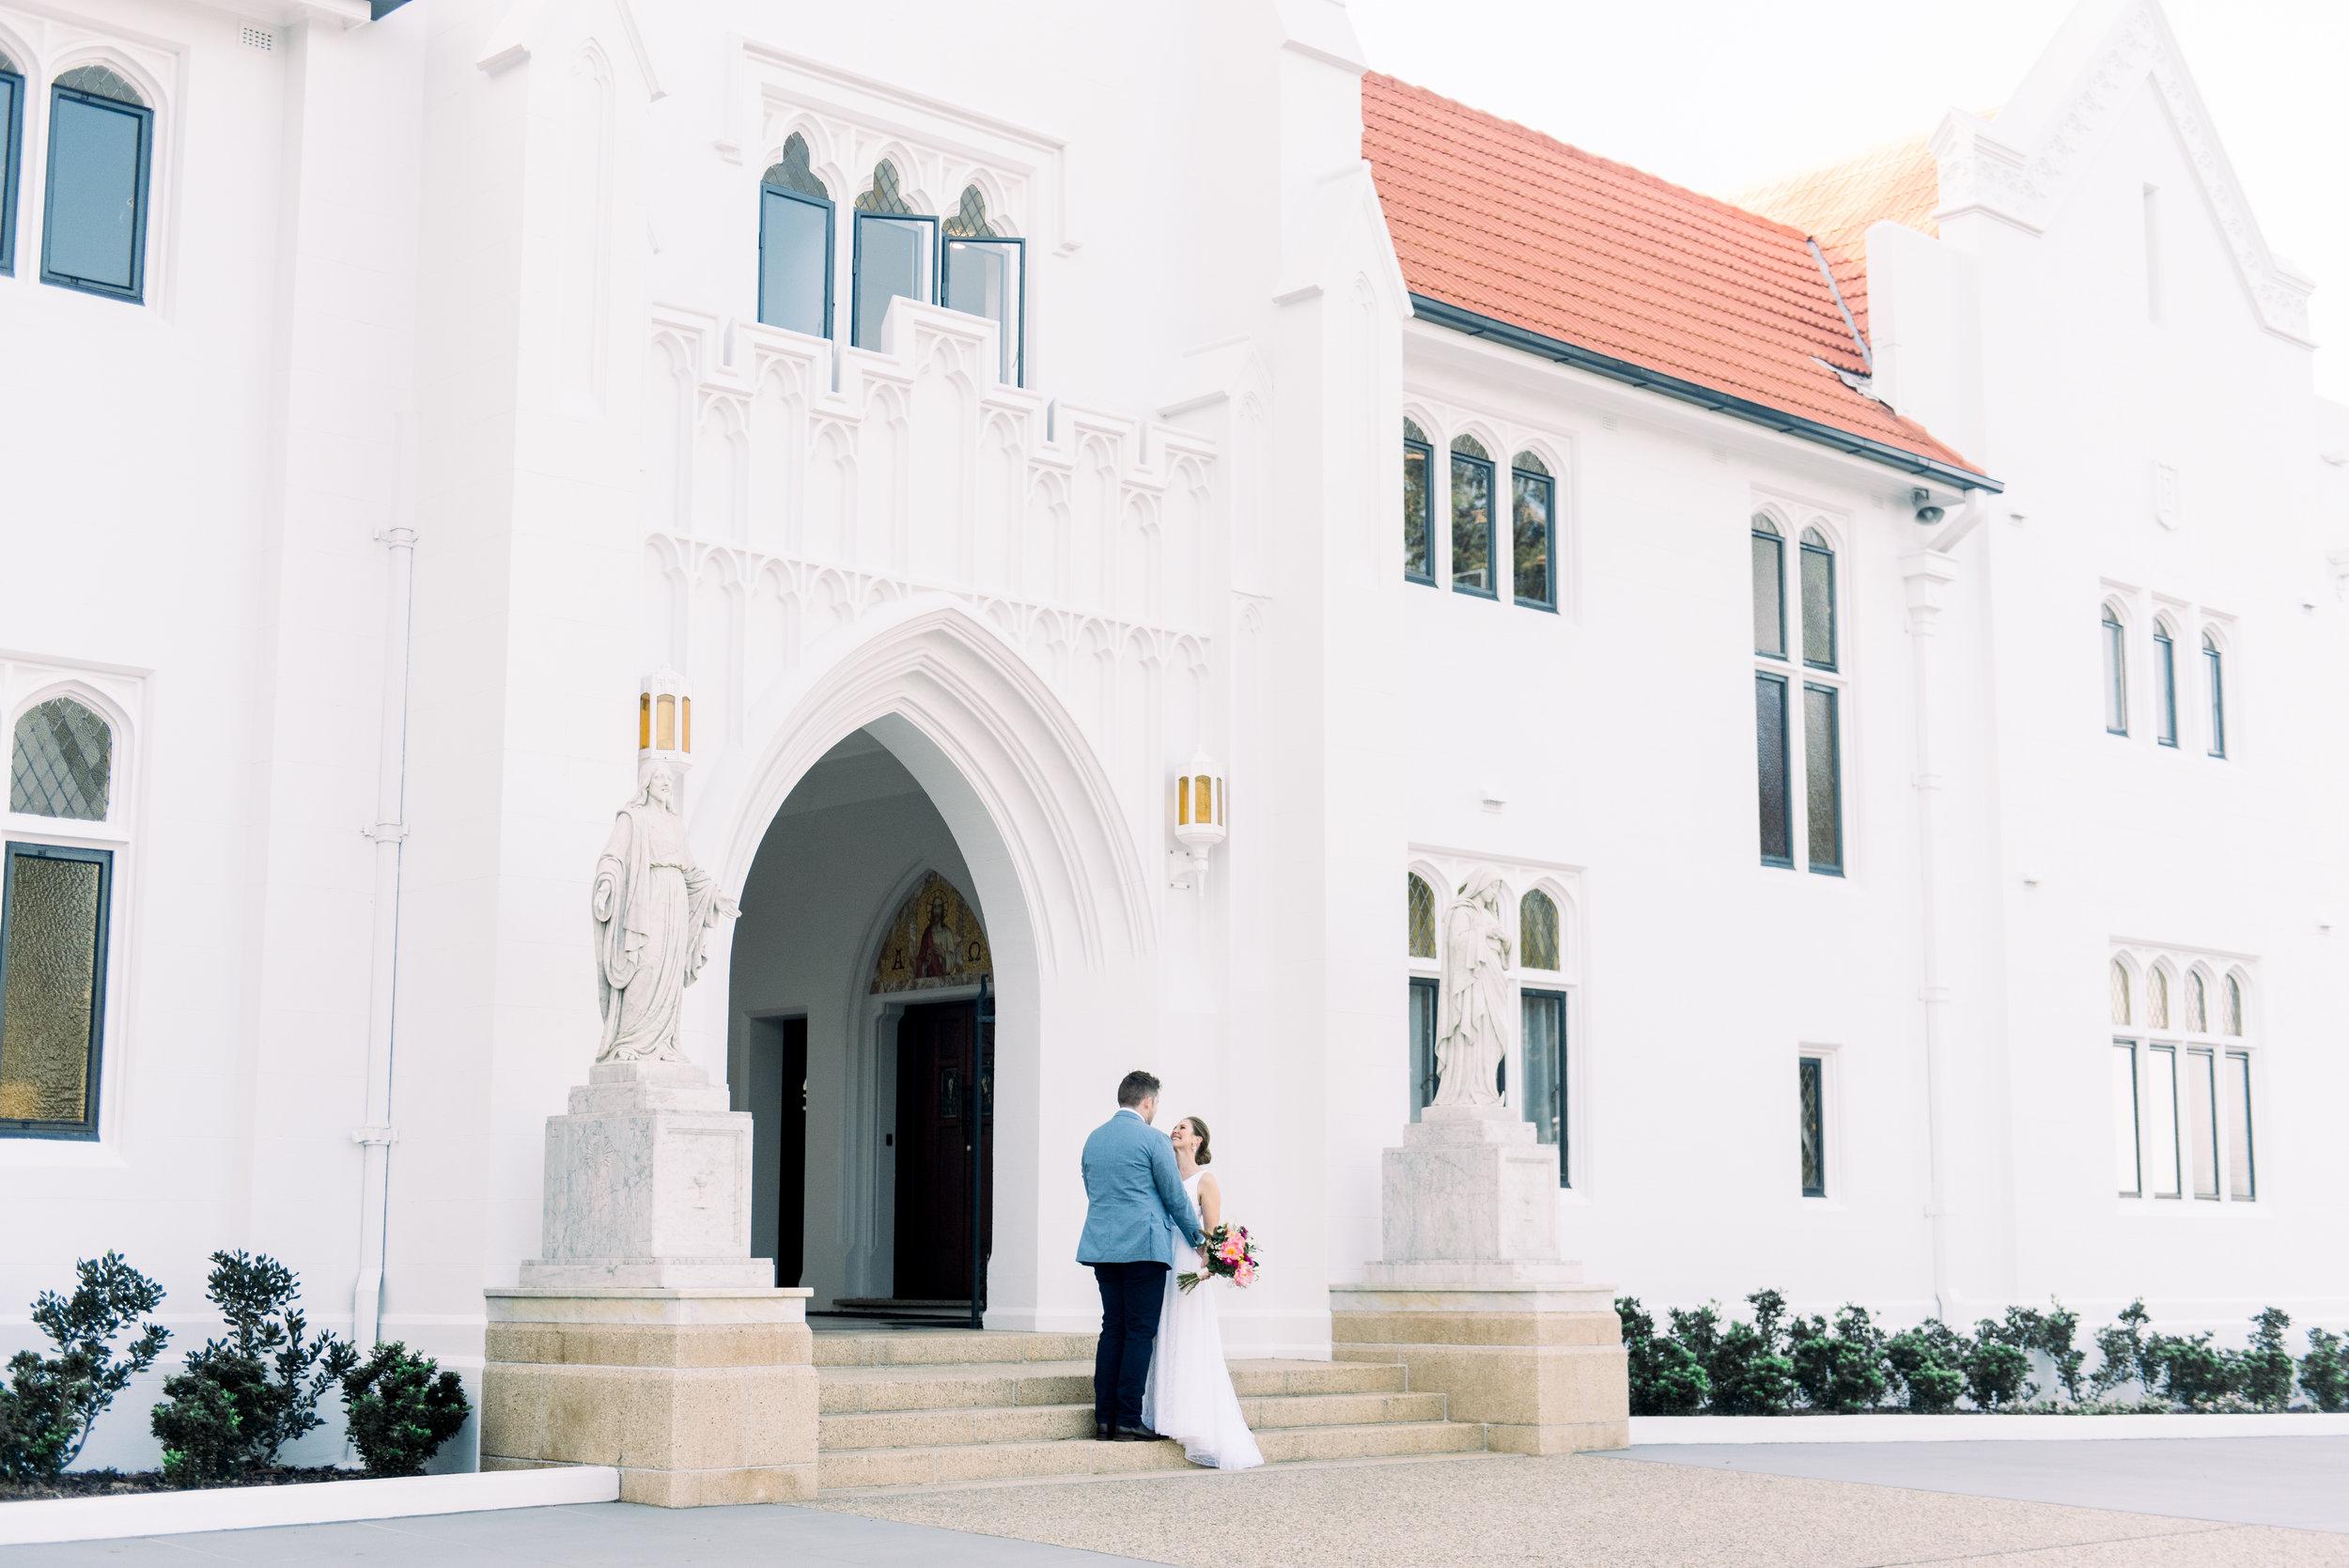 refinery-wedding-brisbane-city-wedding-photographer-57.jpg